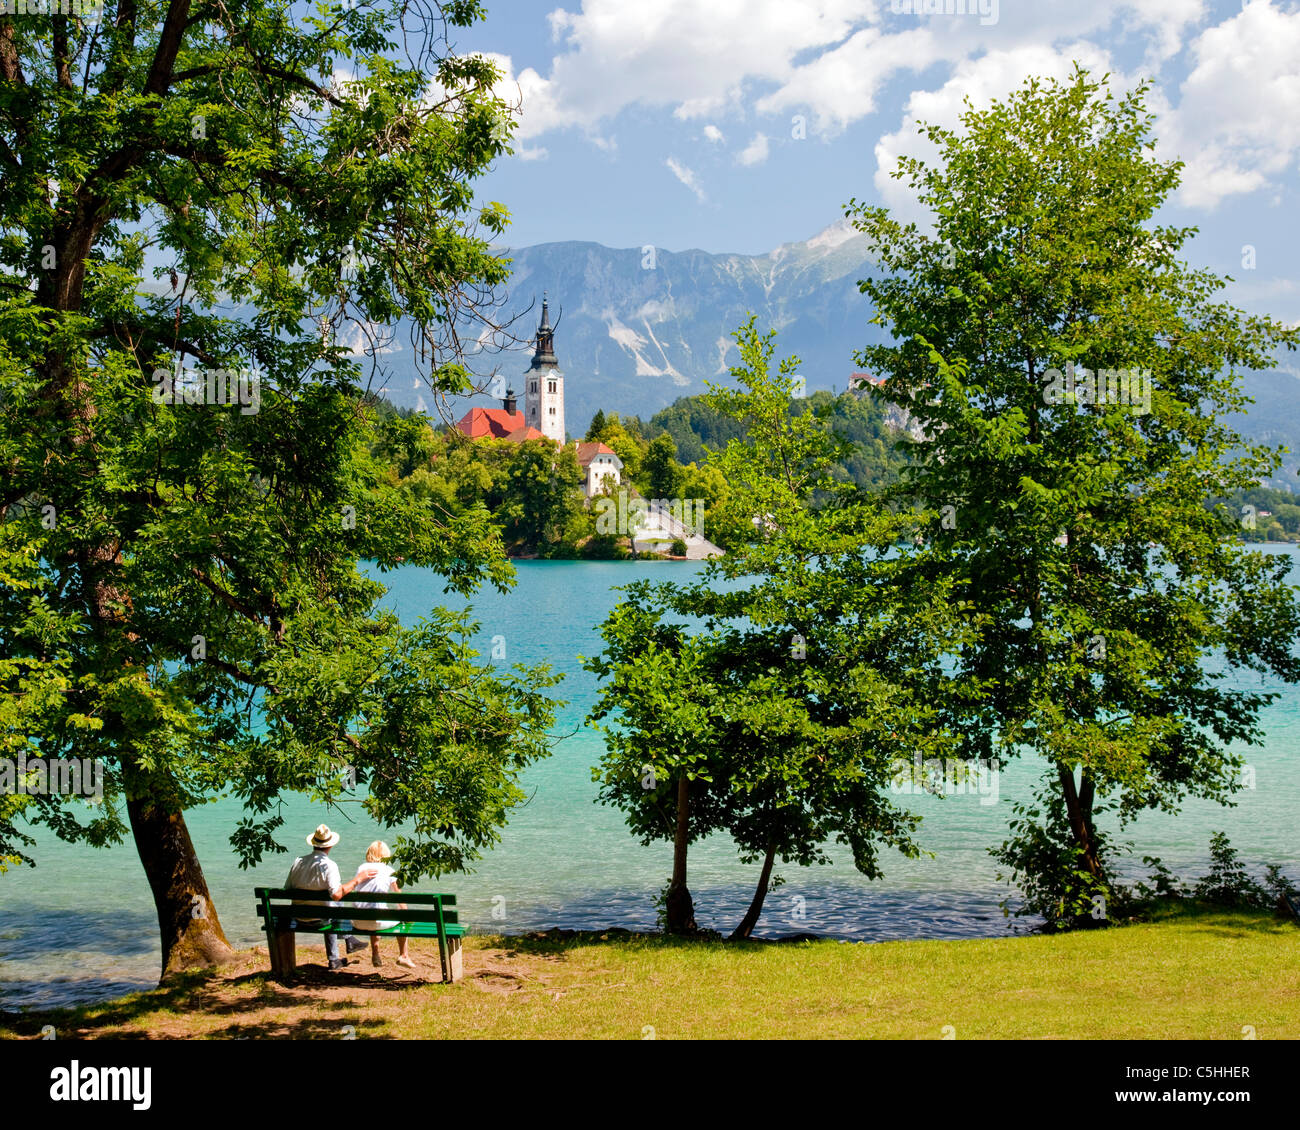 SLO - GORENJSKA REGION: Lake Bled and Island Church of the Assumption - Stock Image